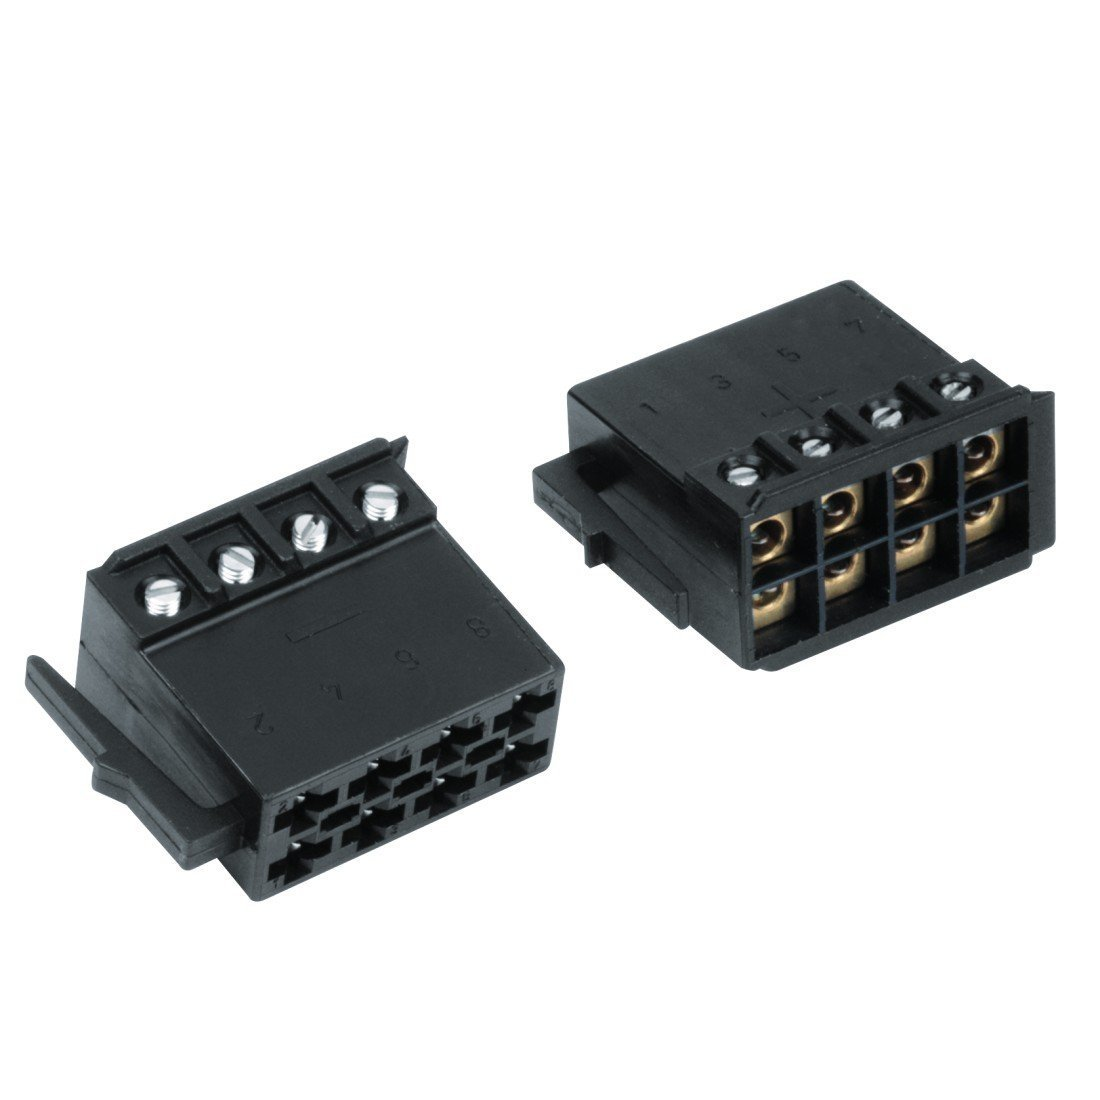 Hama ISO-Lautsprecherstecker schraubbar: Amazon.de: Elektronik